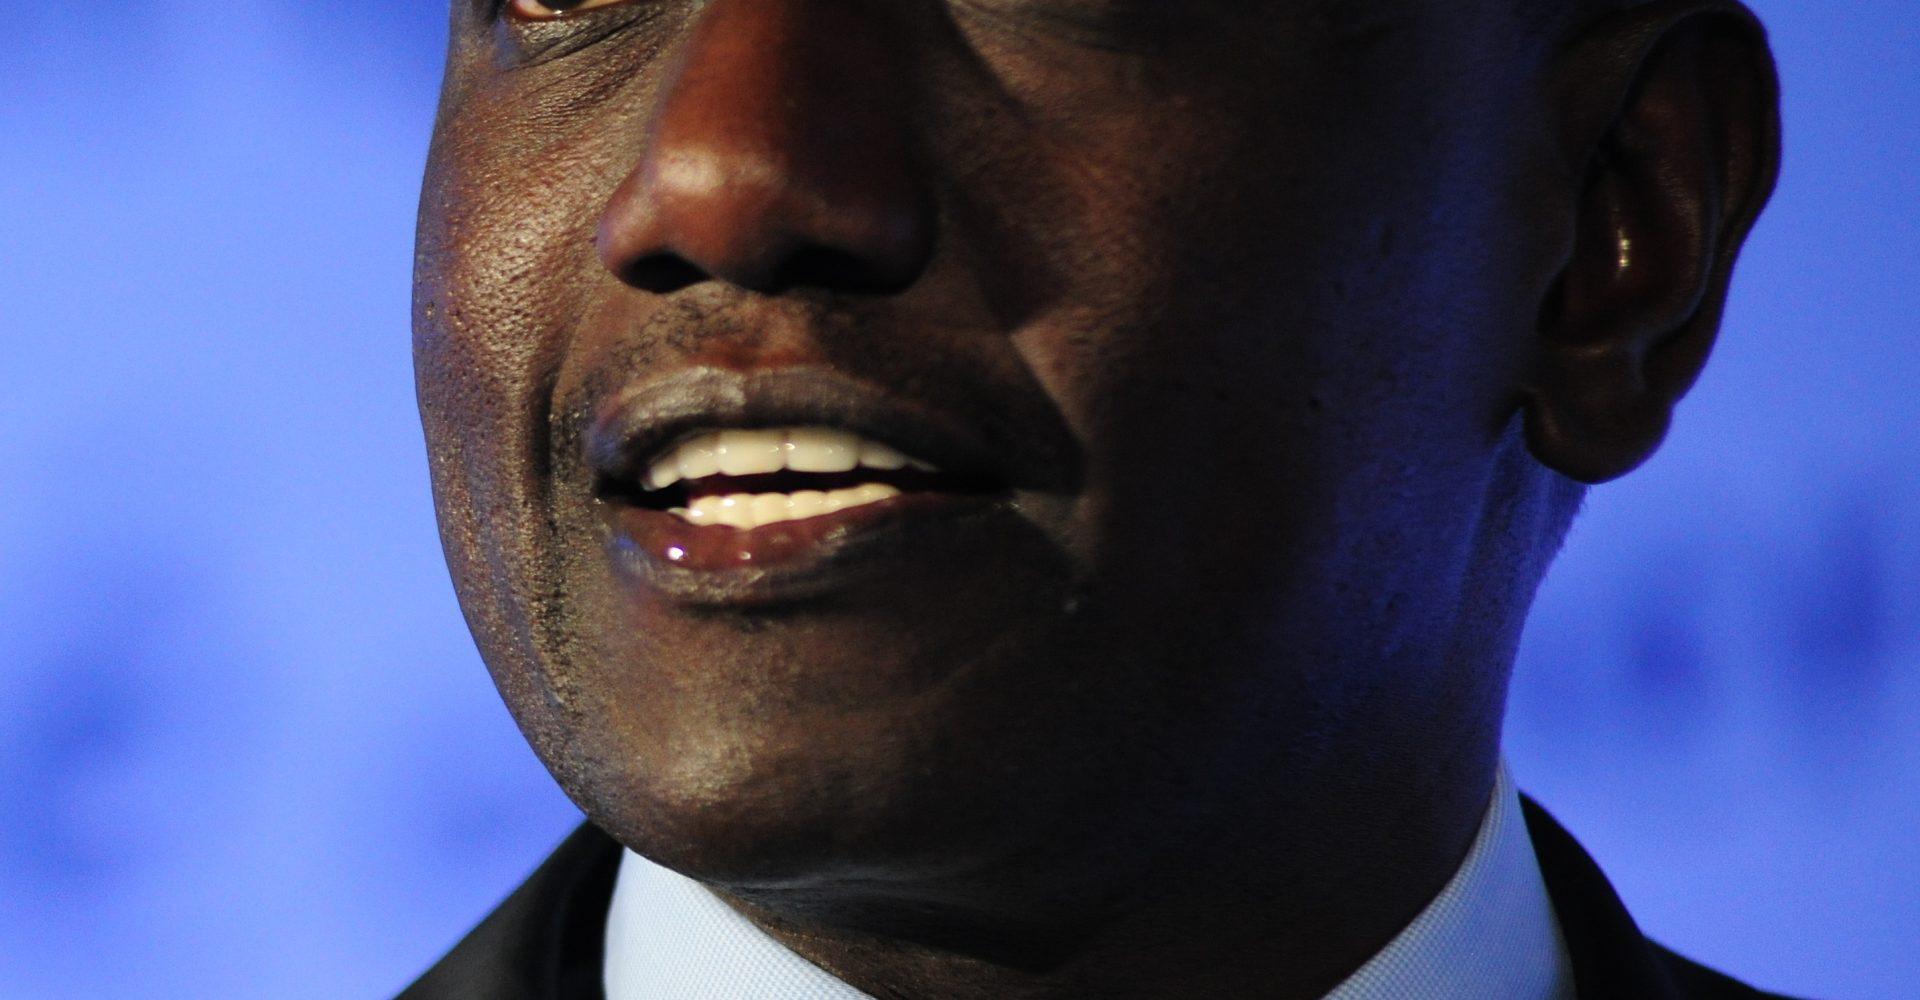 William Ruto has blocked me-Hard-hitting lawyer, Makau Mutua